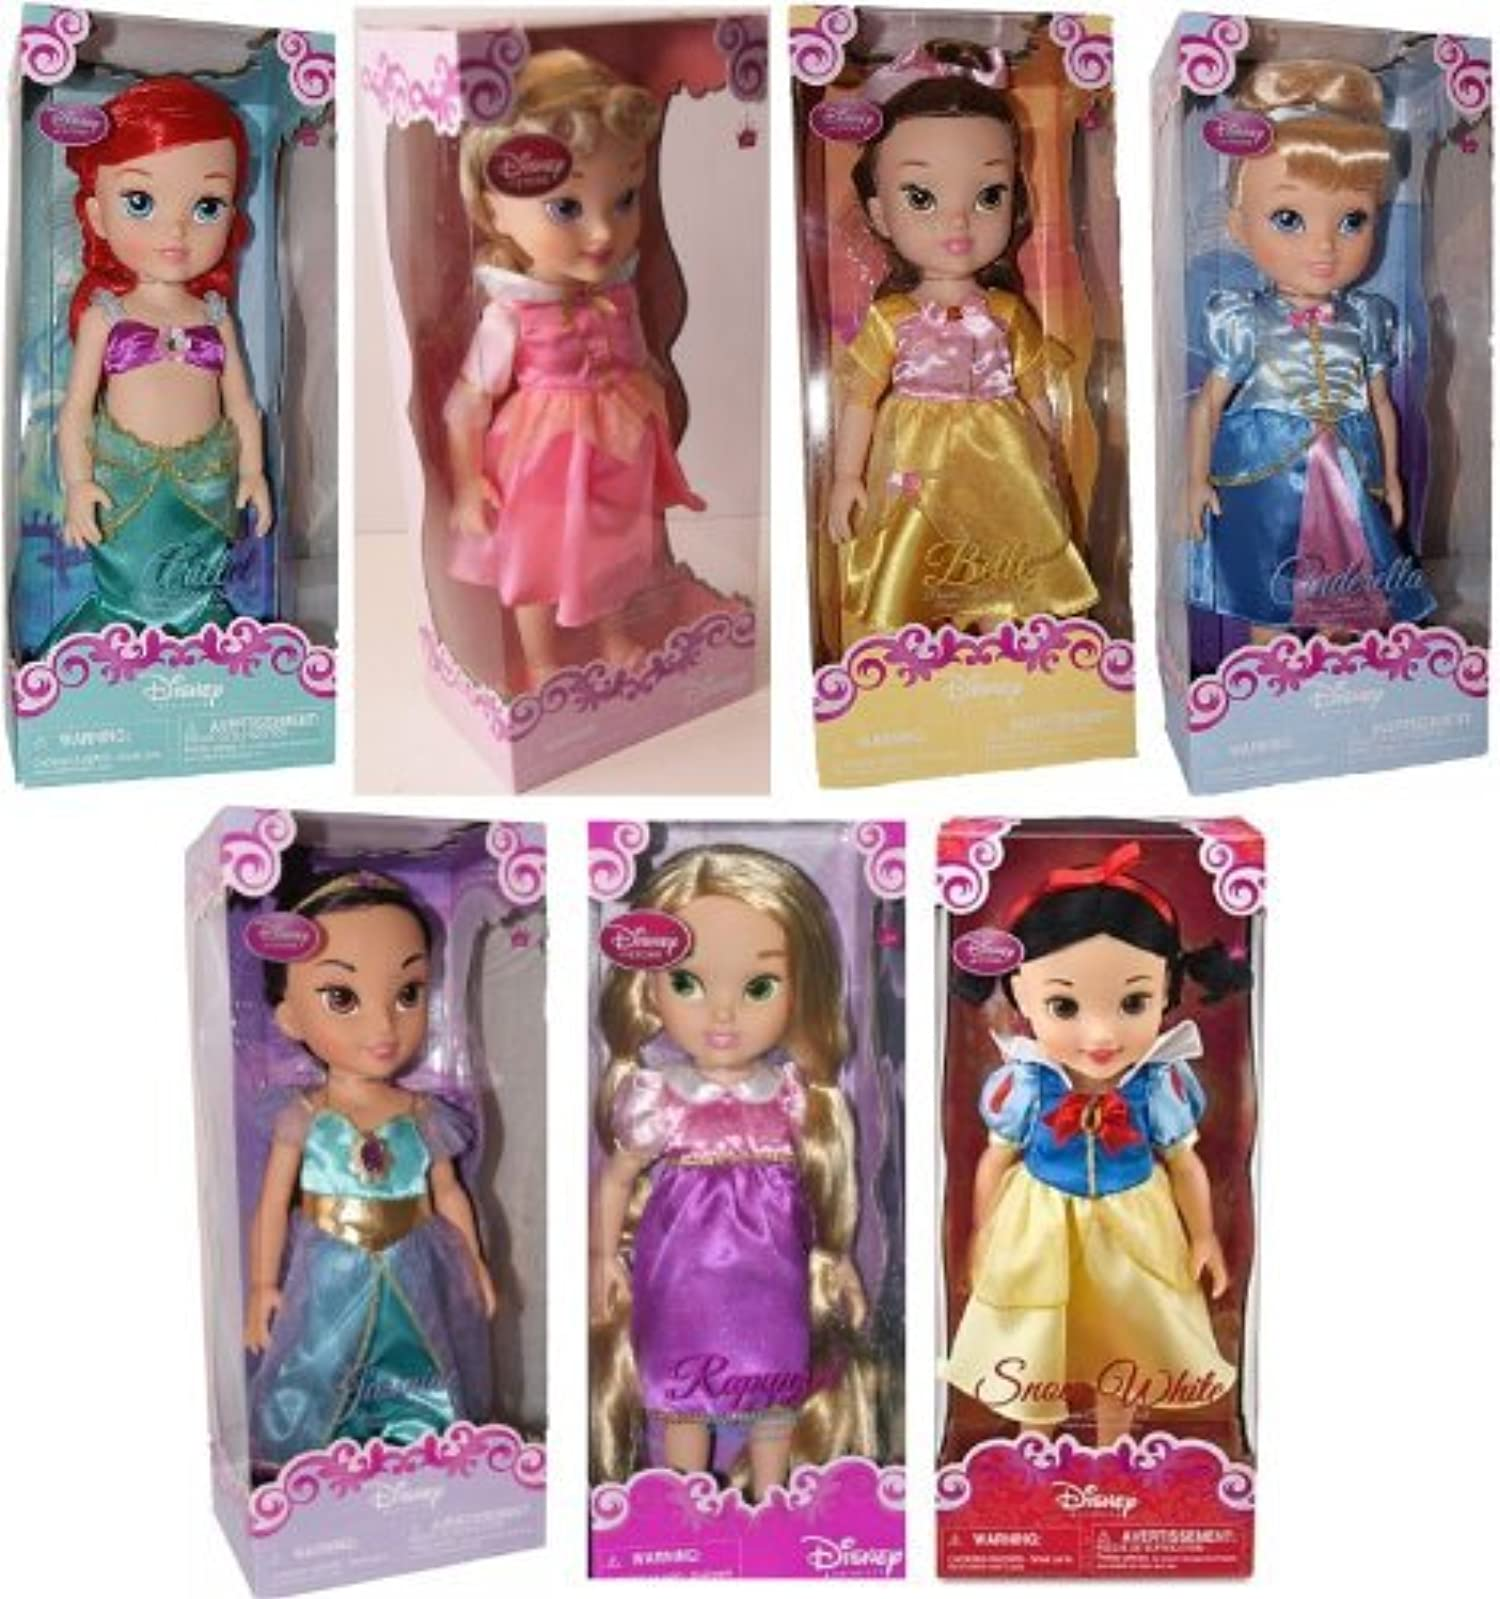 Disney Princess Toddler Doll Cinderella: Disney Store 16 Disney Princess Toddler Doll 7 Pc. Gift